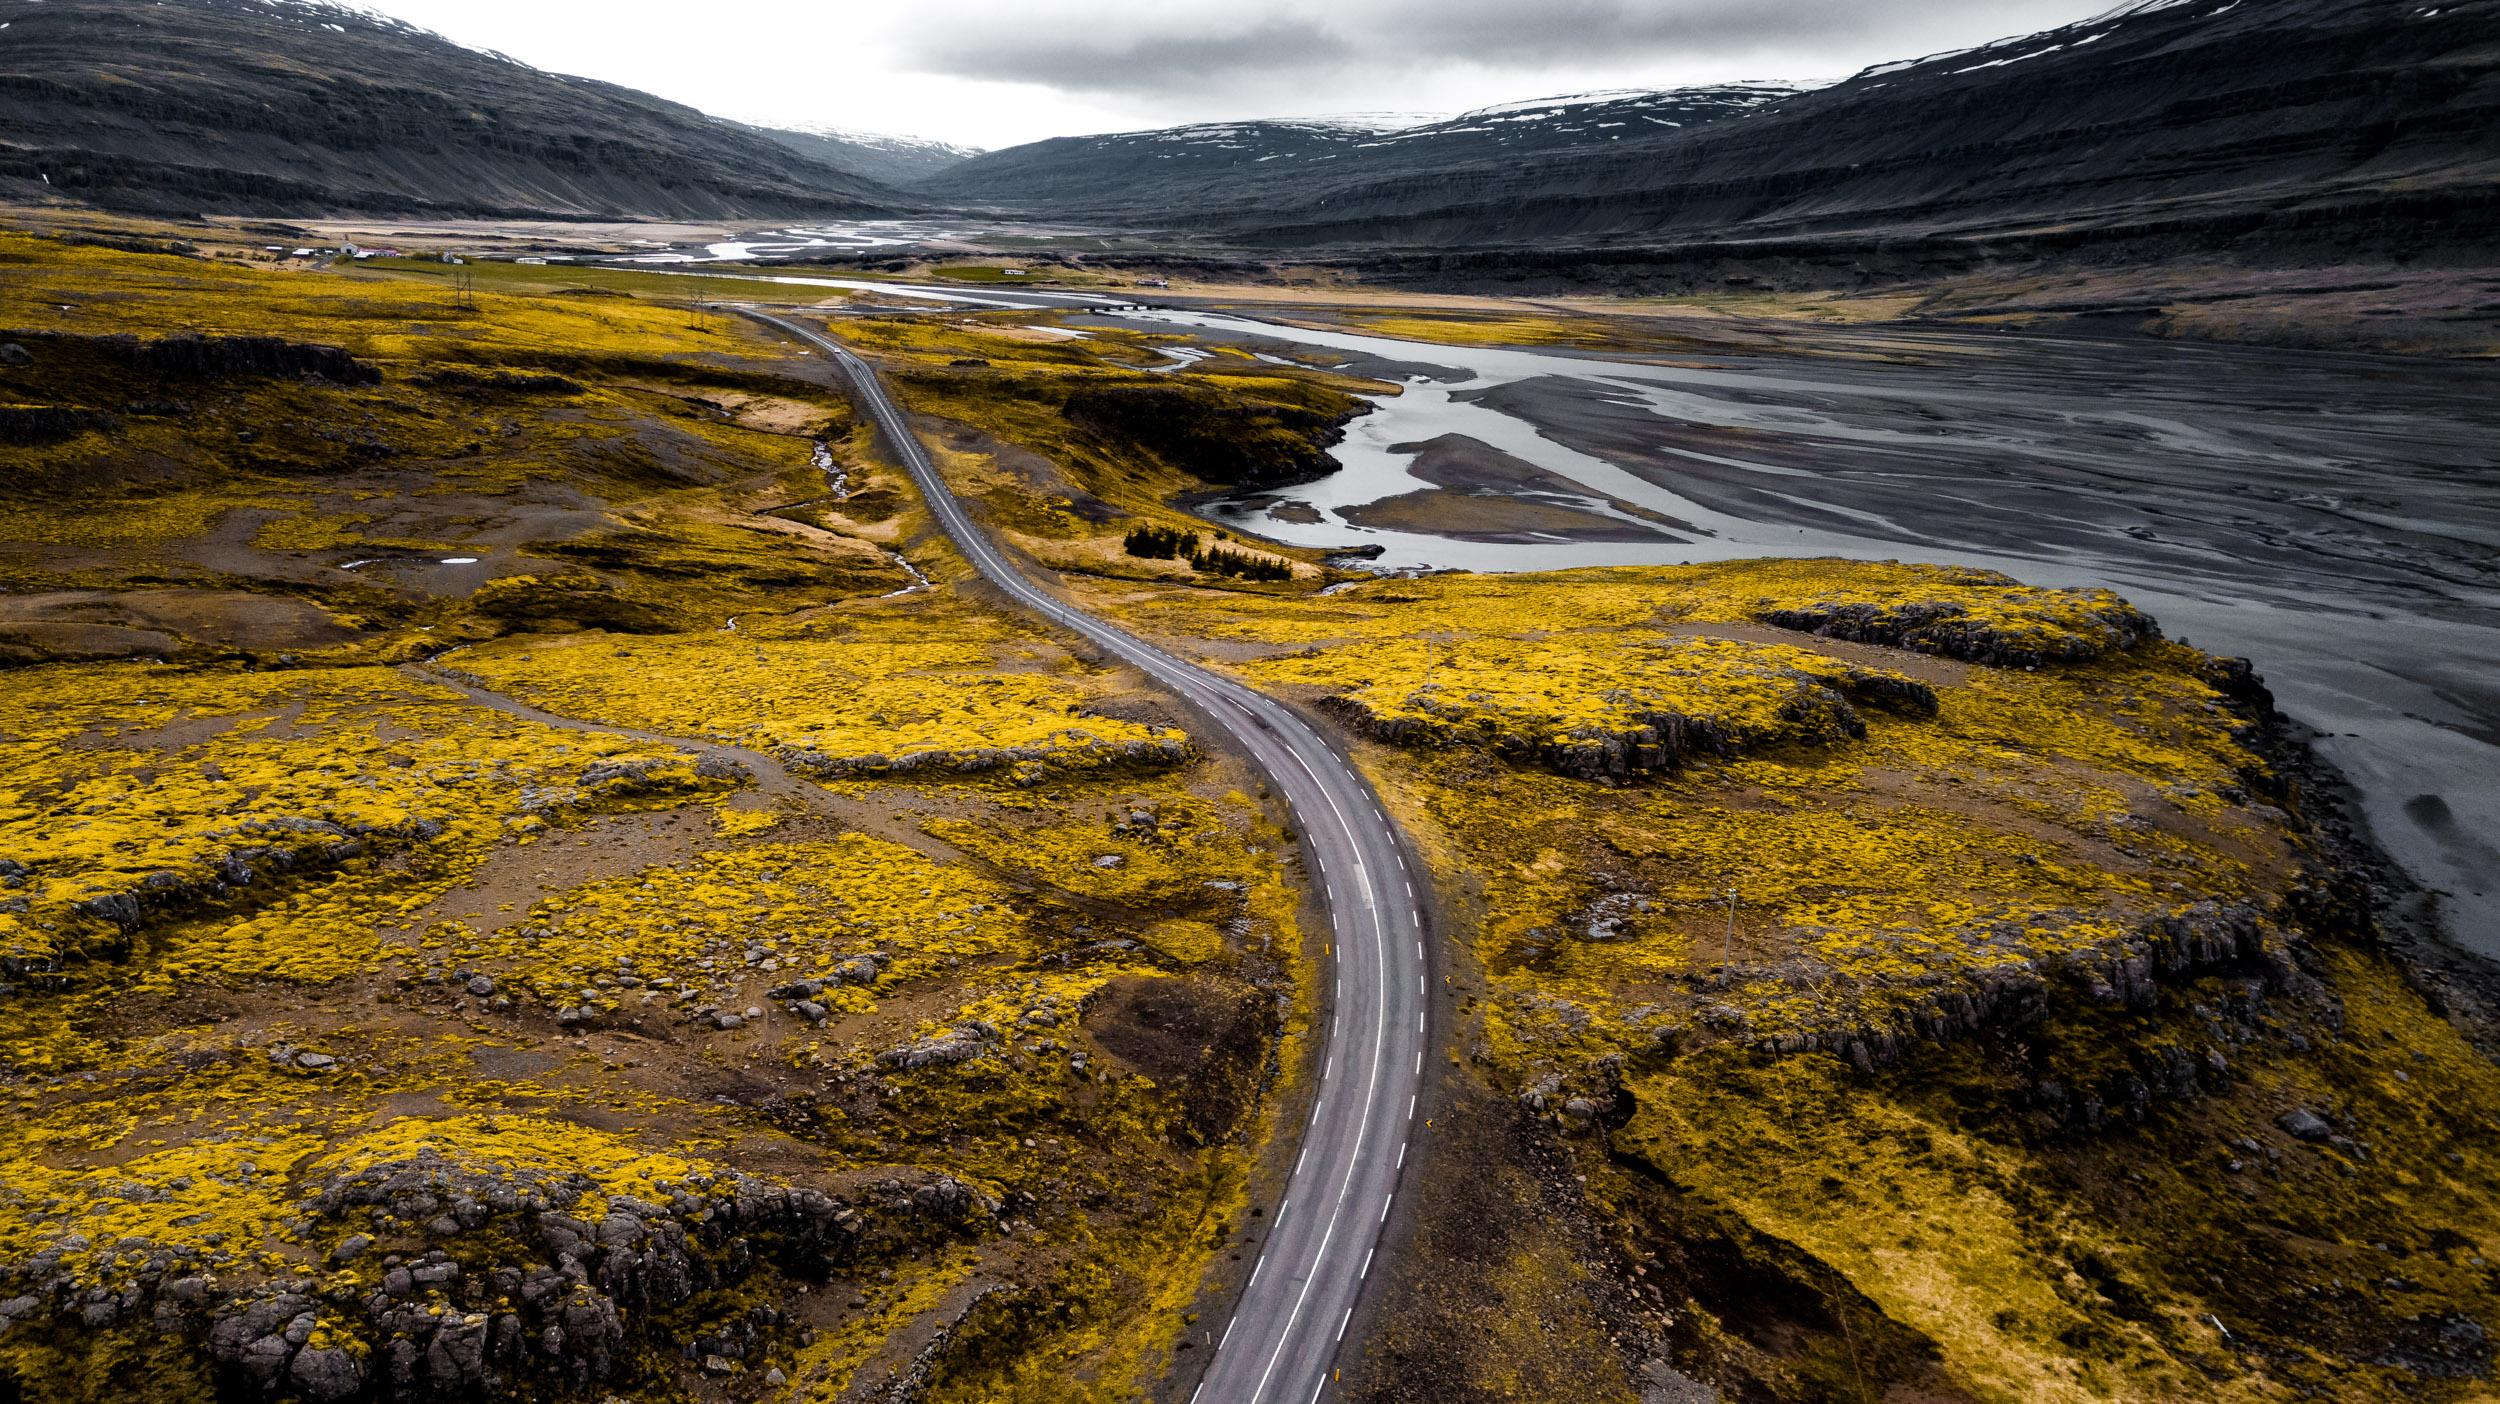 Iceland_JesseEchevarria-15.jpg